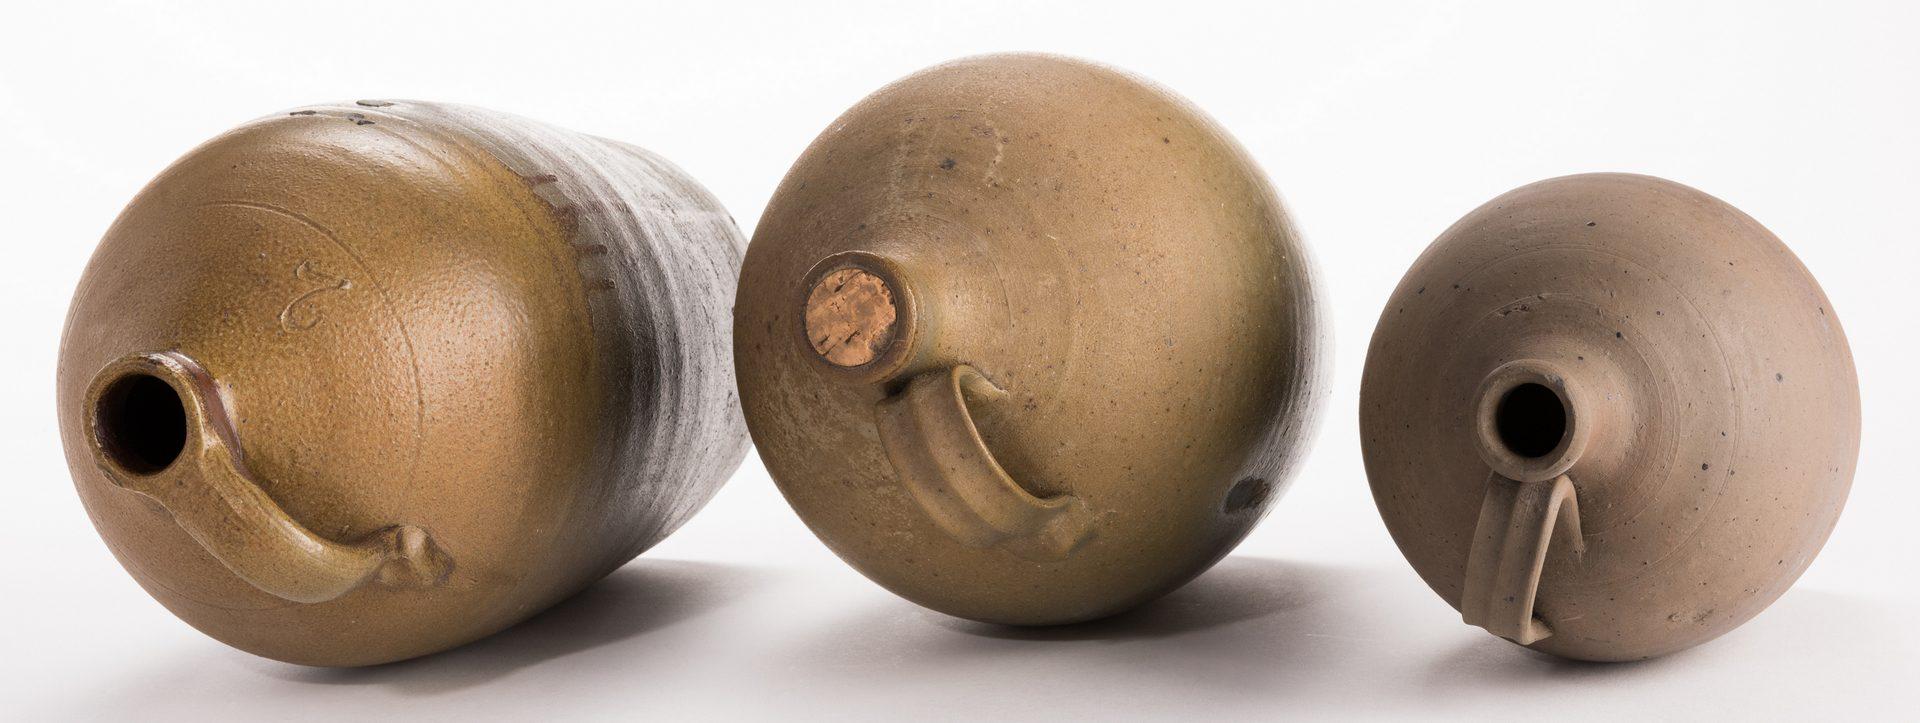 Lot 188: 3 Middle TN Stoneware Pottery Jugs